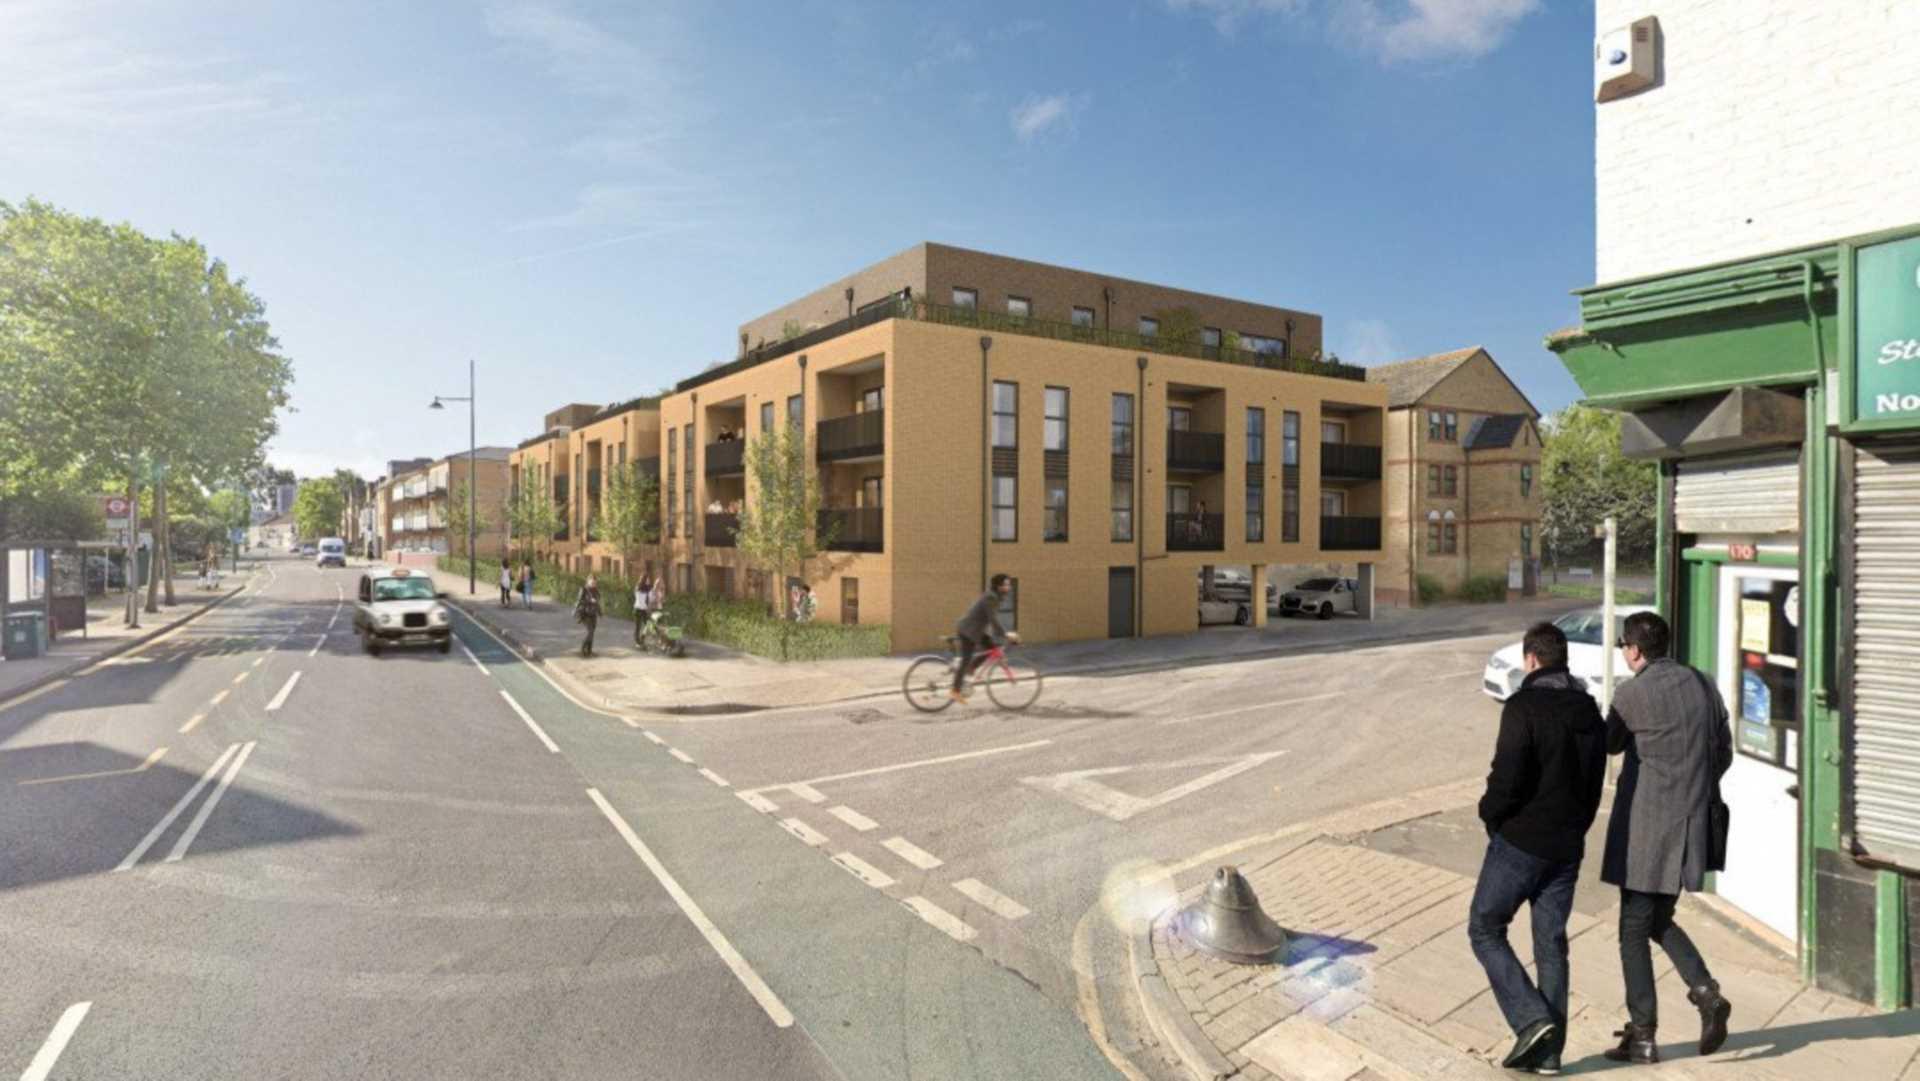 London Living Rent - Elliston House, West Street, Erith